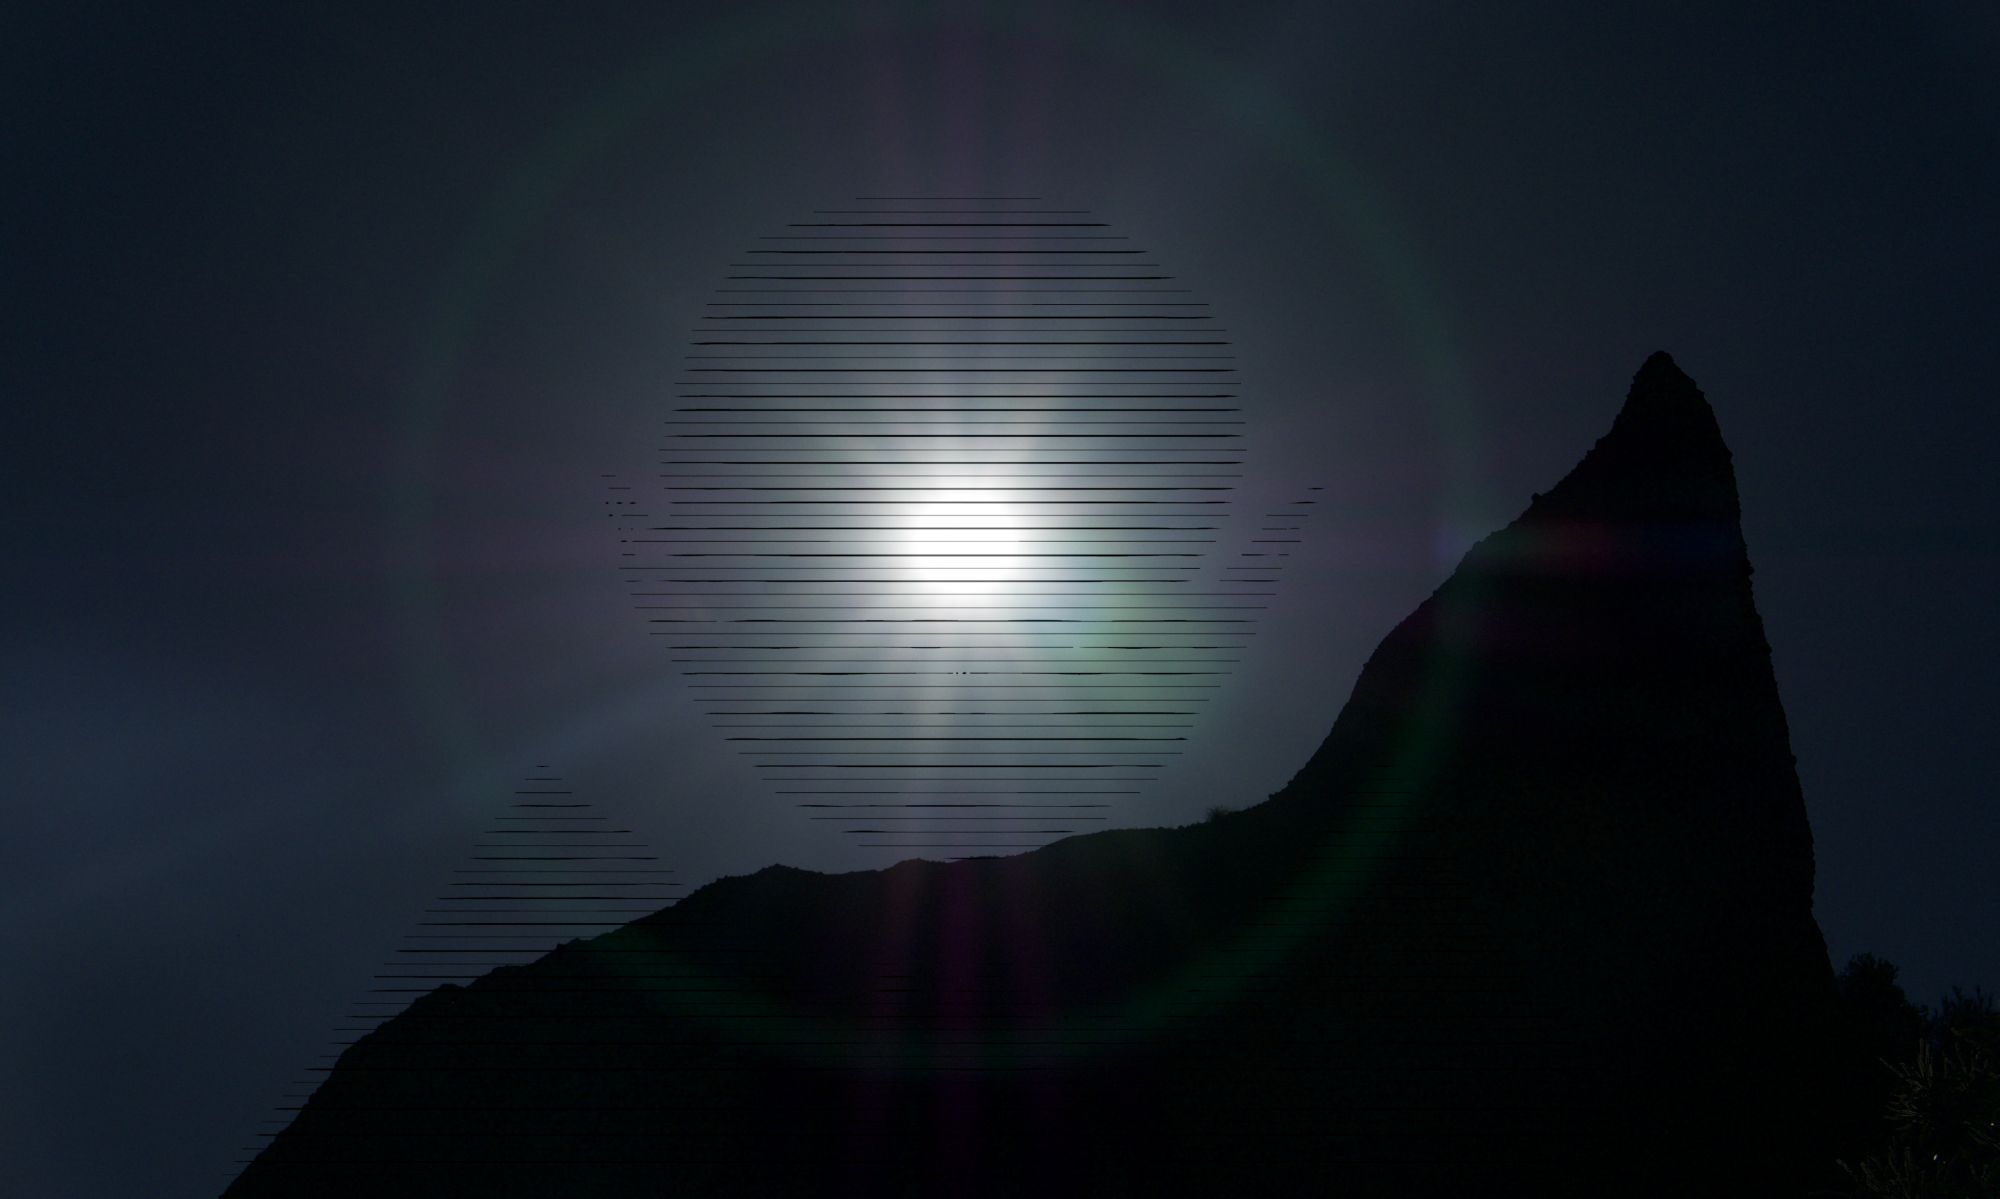 Espectro Visível